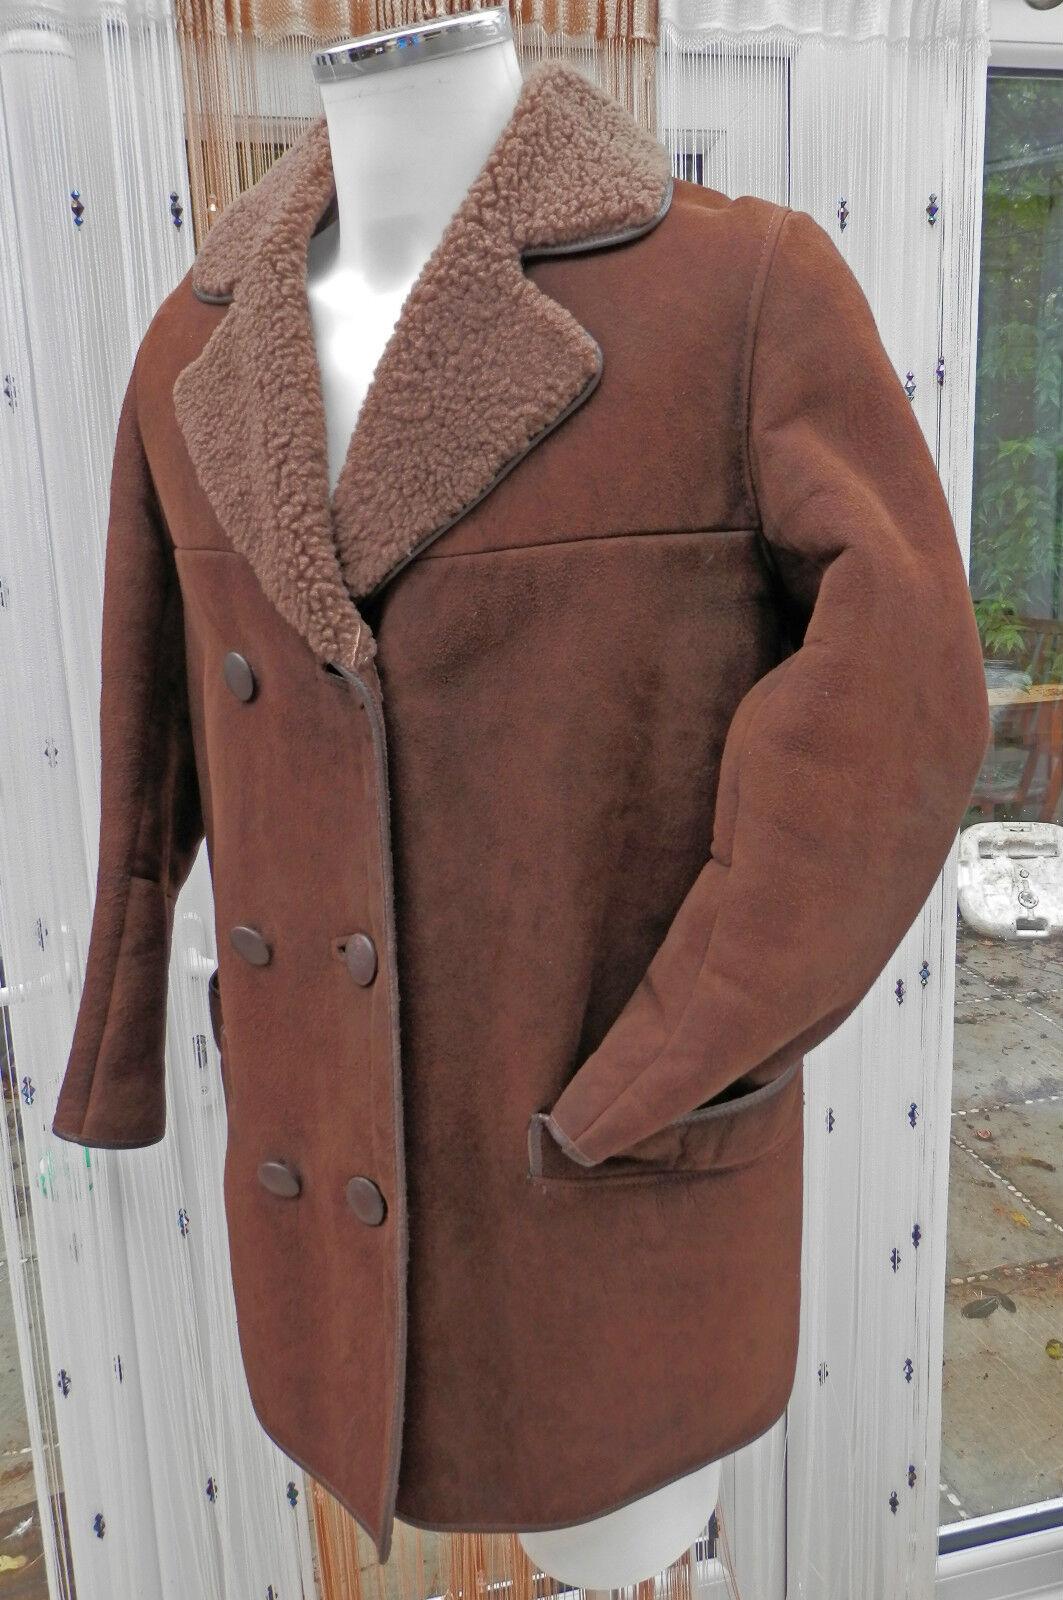 LADIES SHEEPSKIN COAT SIZE 16 RANCH TOUGH WEAR ANY WEATHER